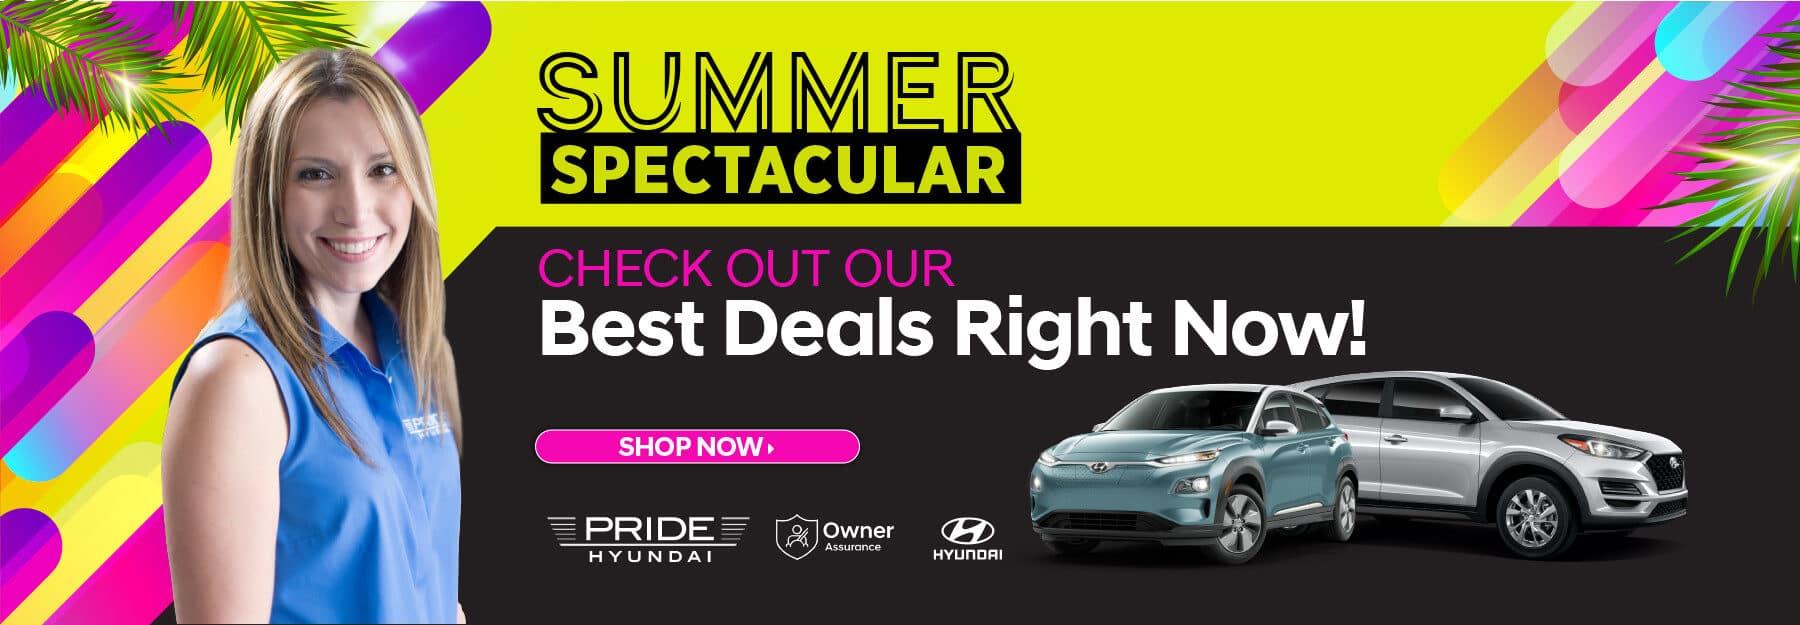 2021.07.27-Pride-Hyundai-August-Web-Banner-S53400vw